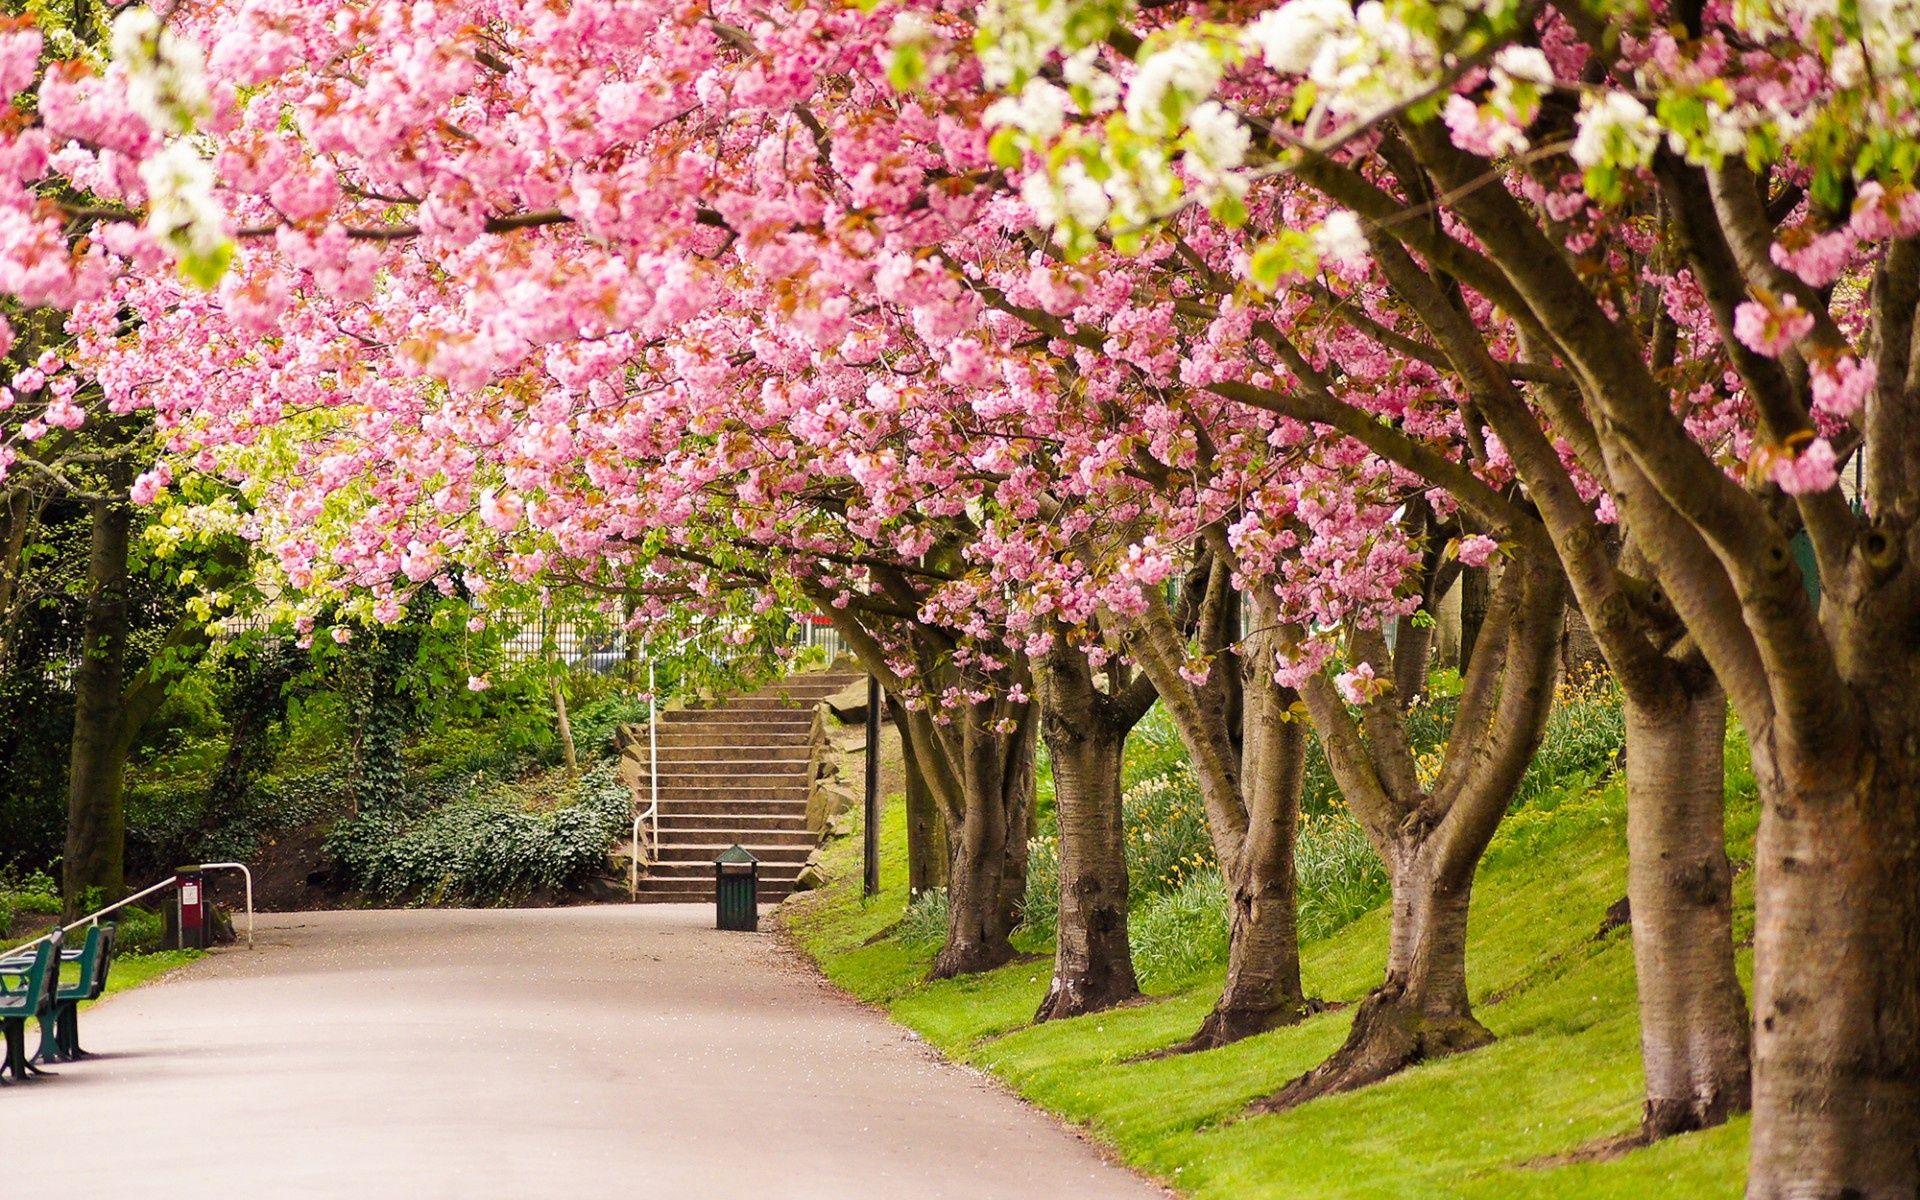 Sheffield England Park Tree Cherry Blossom Road Alley In Spring Nature Desktop Wallpaper Nature Desktop Beautiful Nature Wallpaper